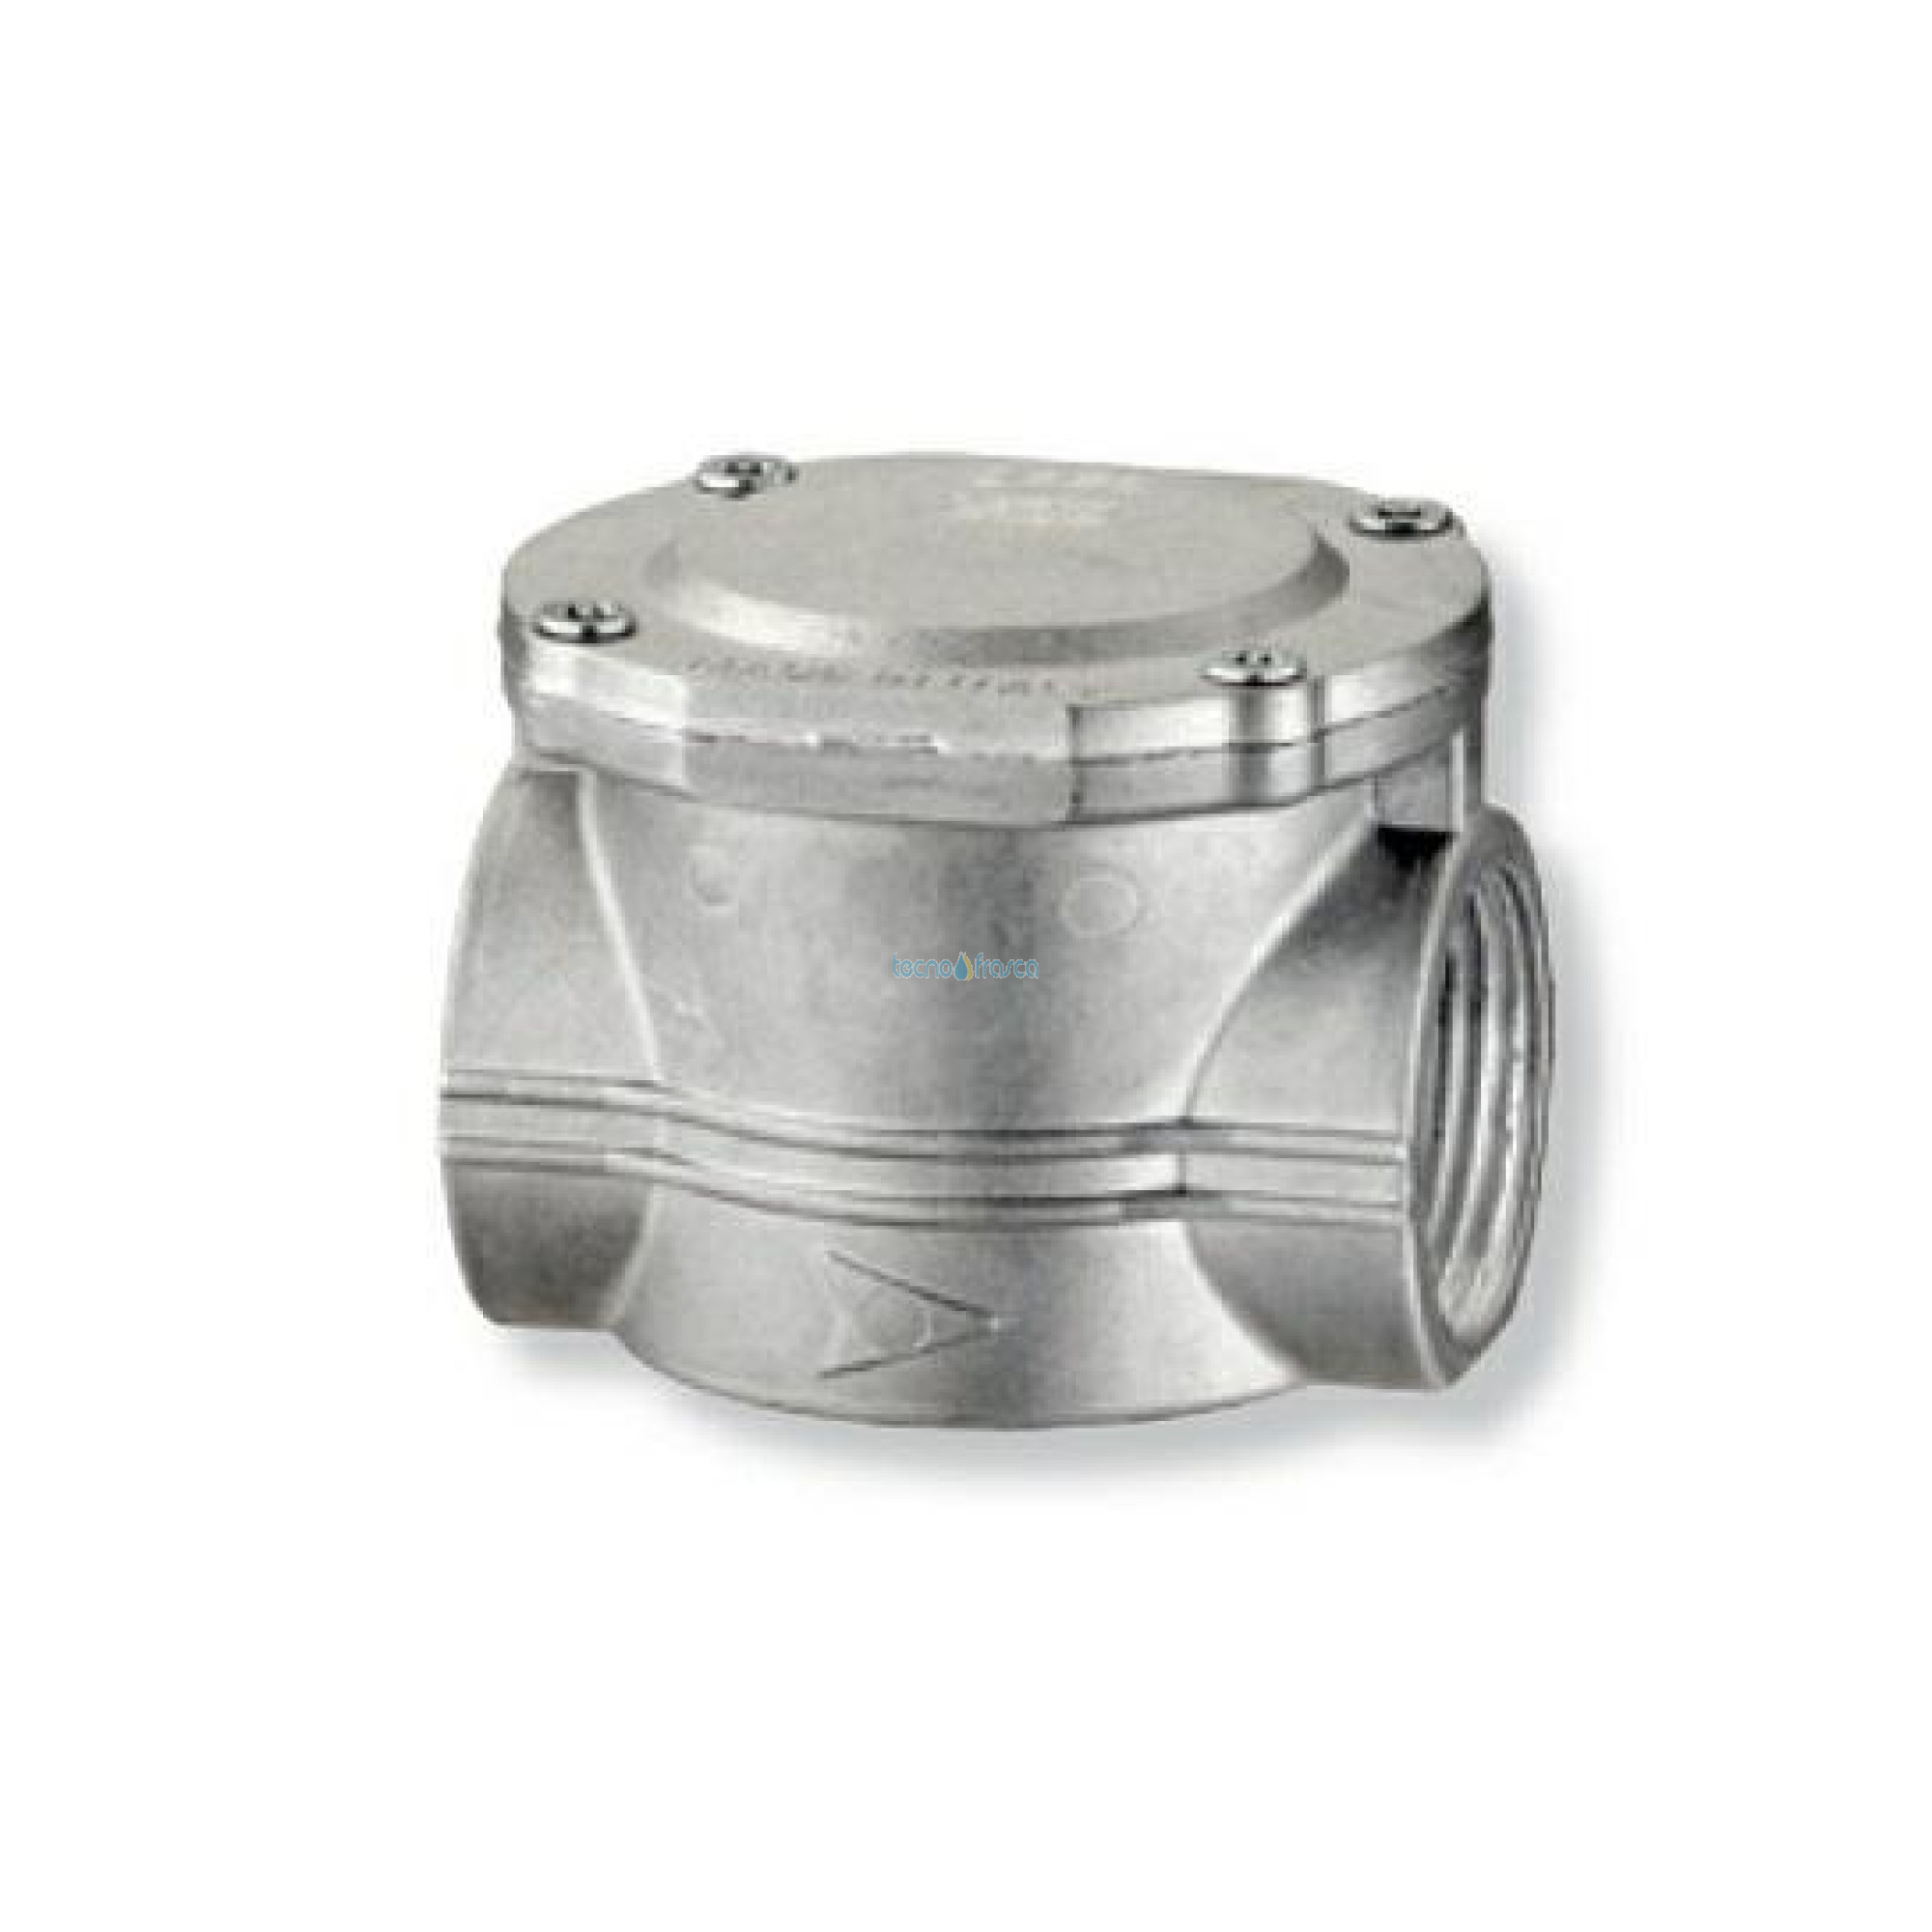 Filtro gas 1/2 small capacity pmax 6bar gf015sc